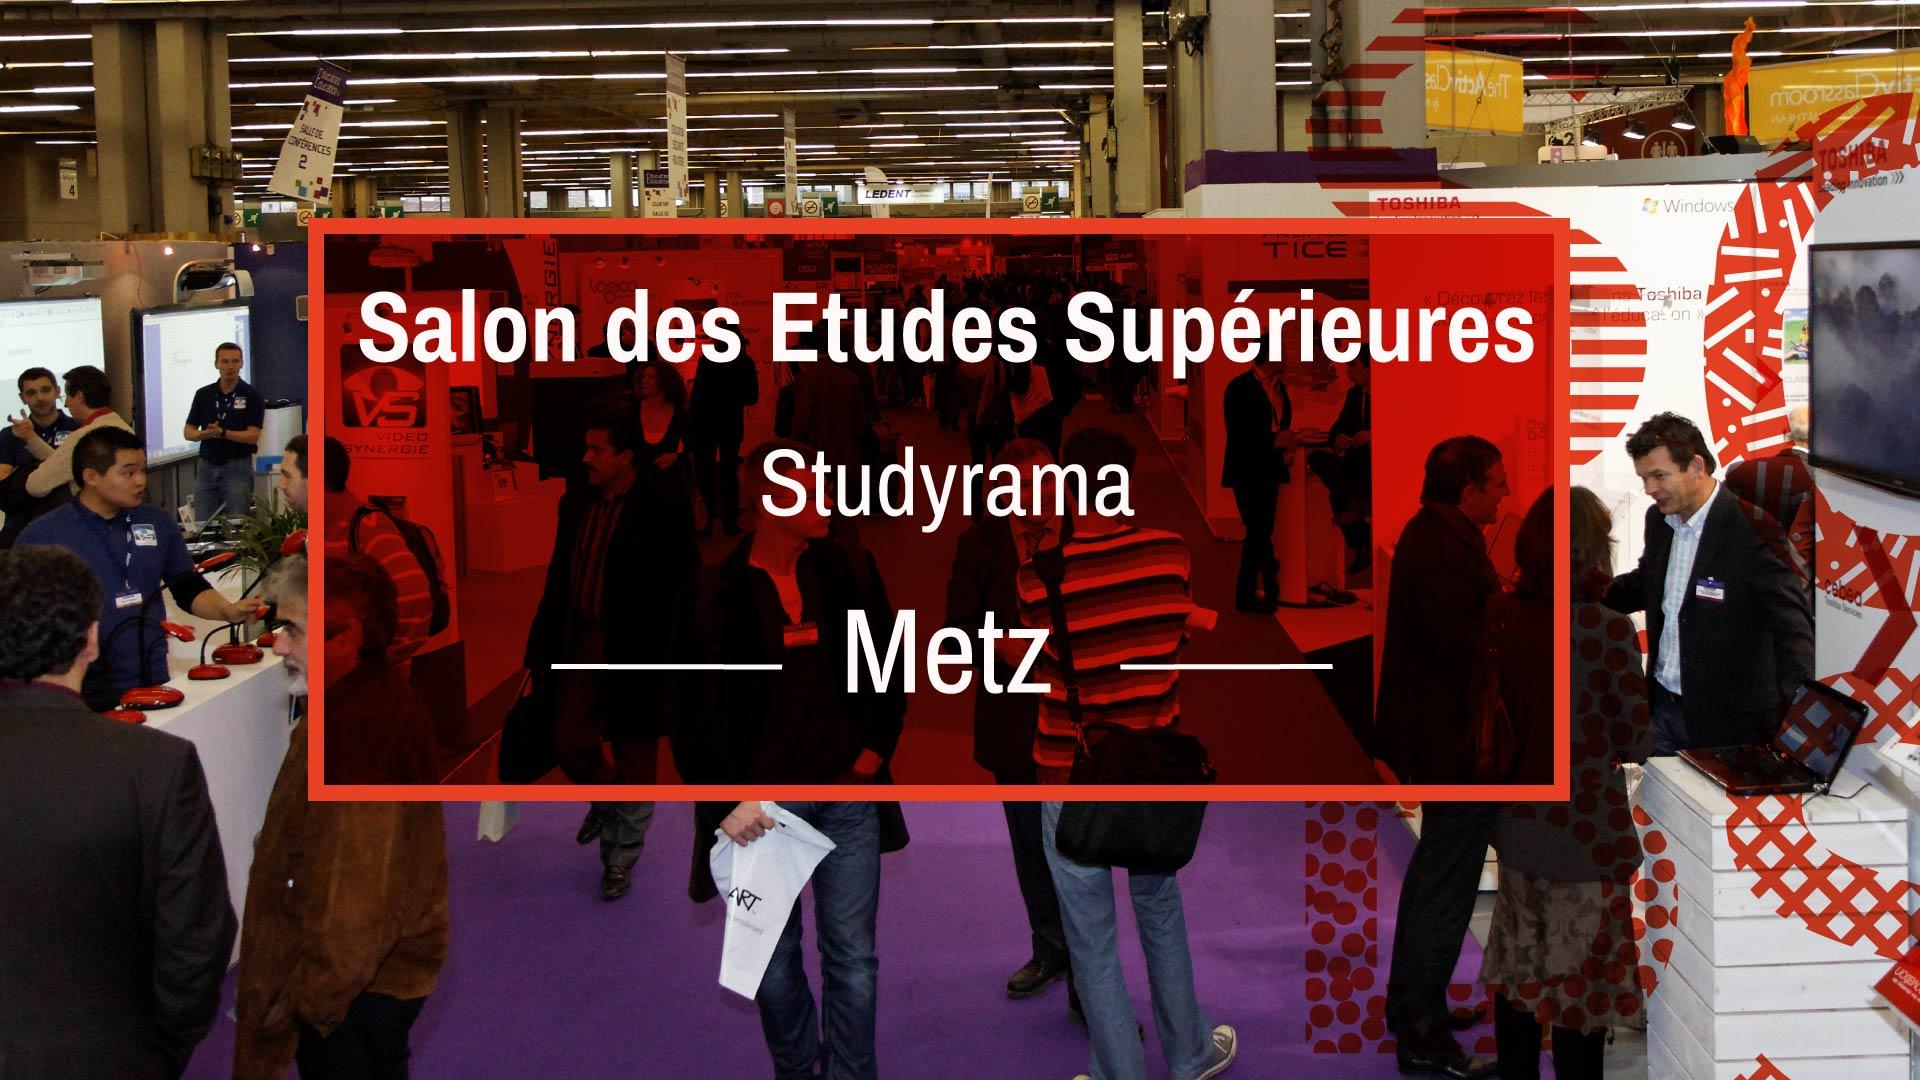 Salon-Studyrama-Metz